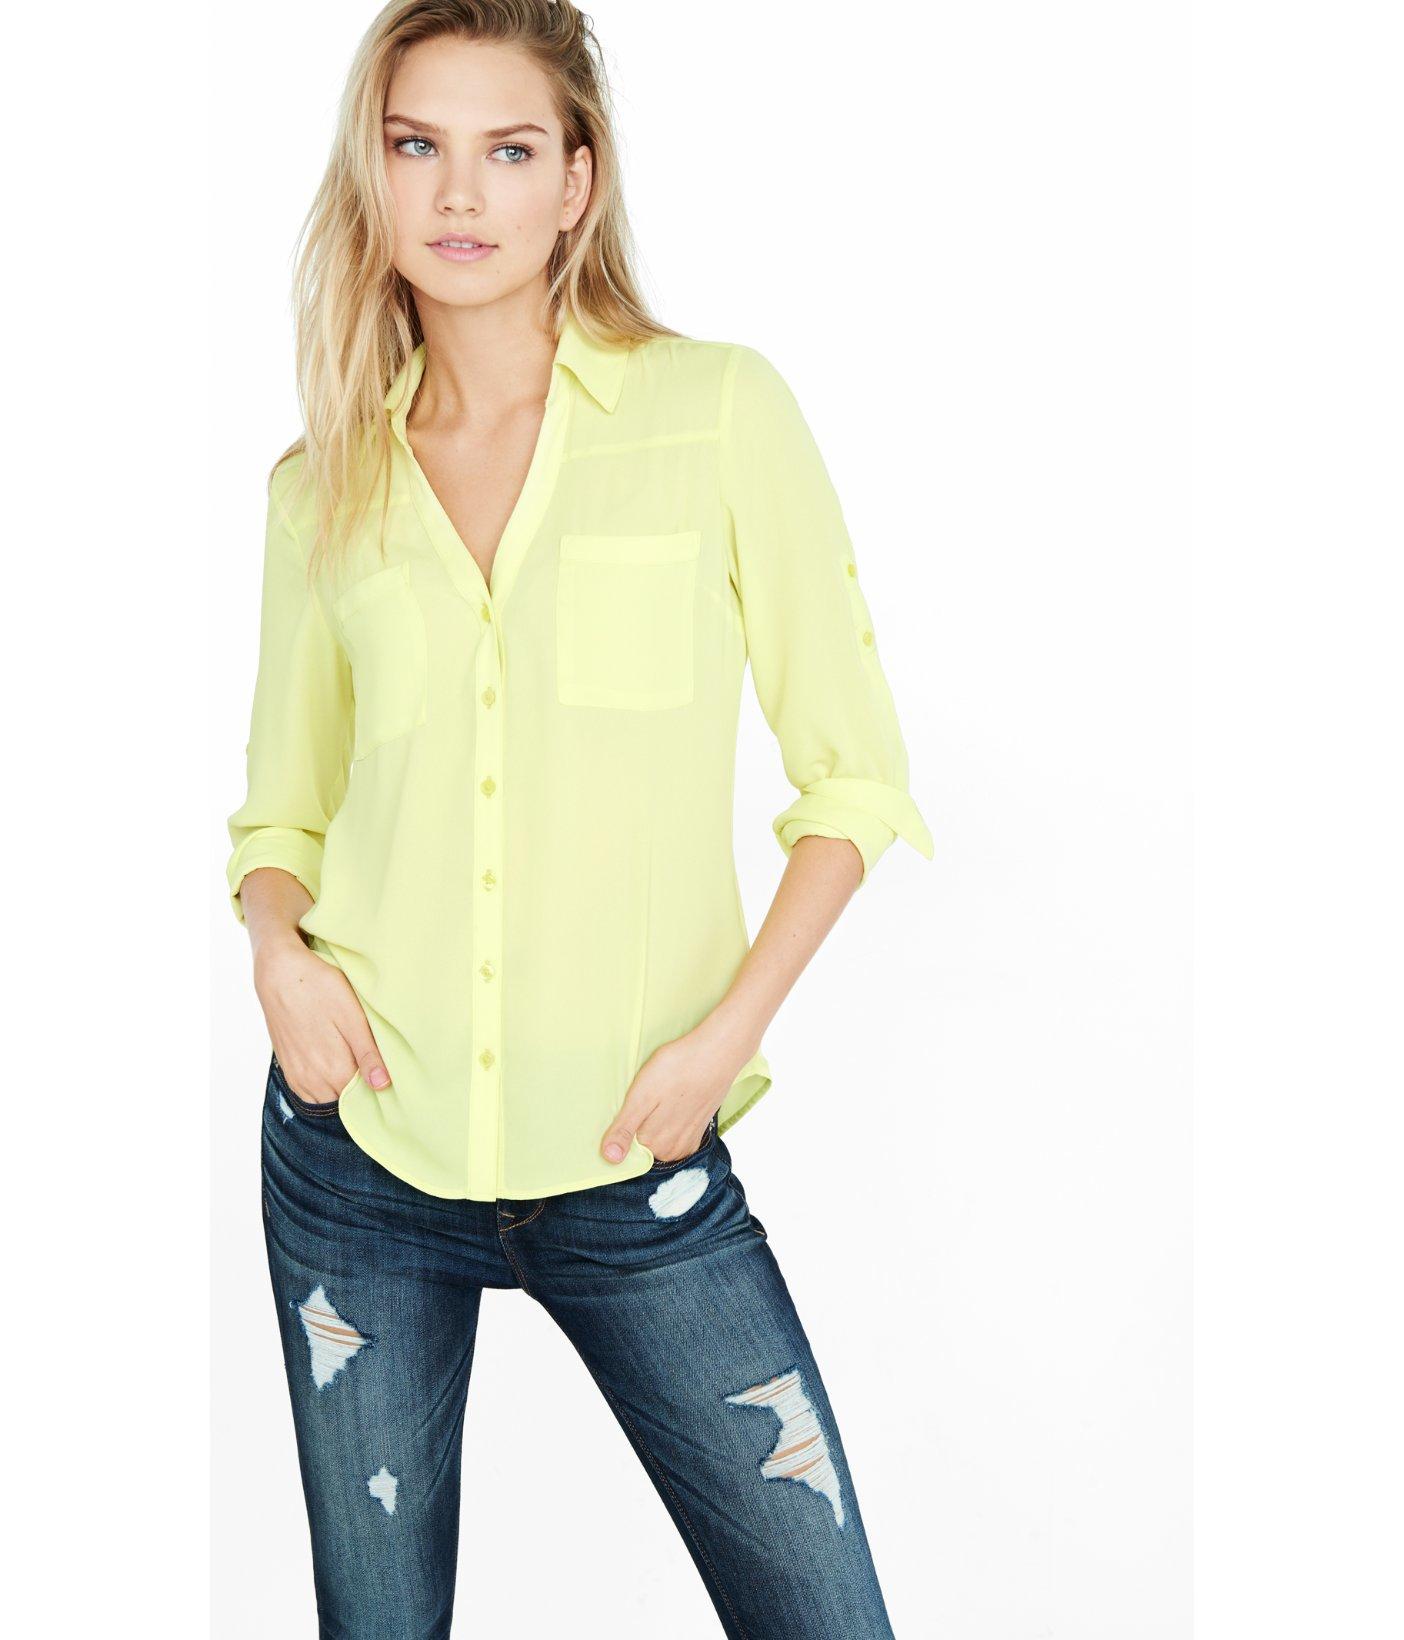 7115d53ed1dc2 Lyst - Express Original Fit Convertible Sleeve Portofino Shirt in Yellow